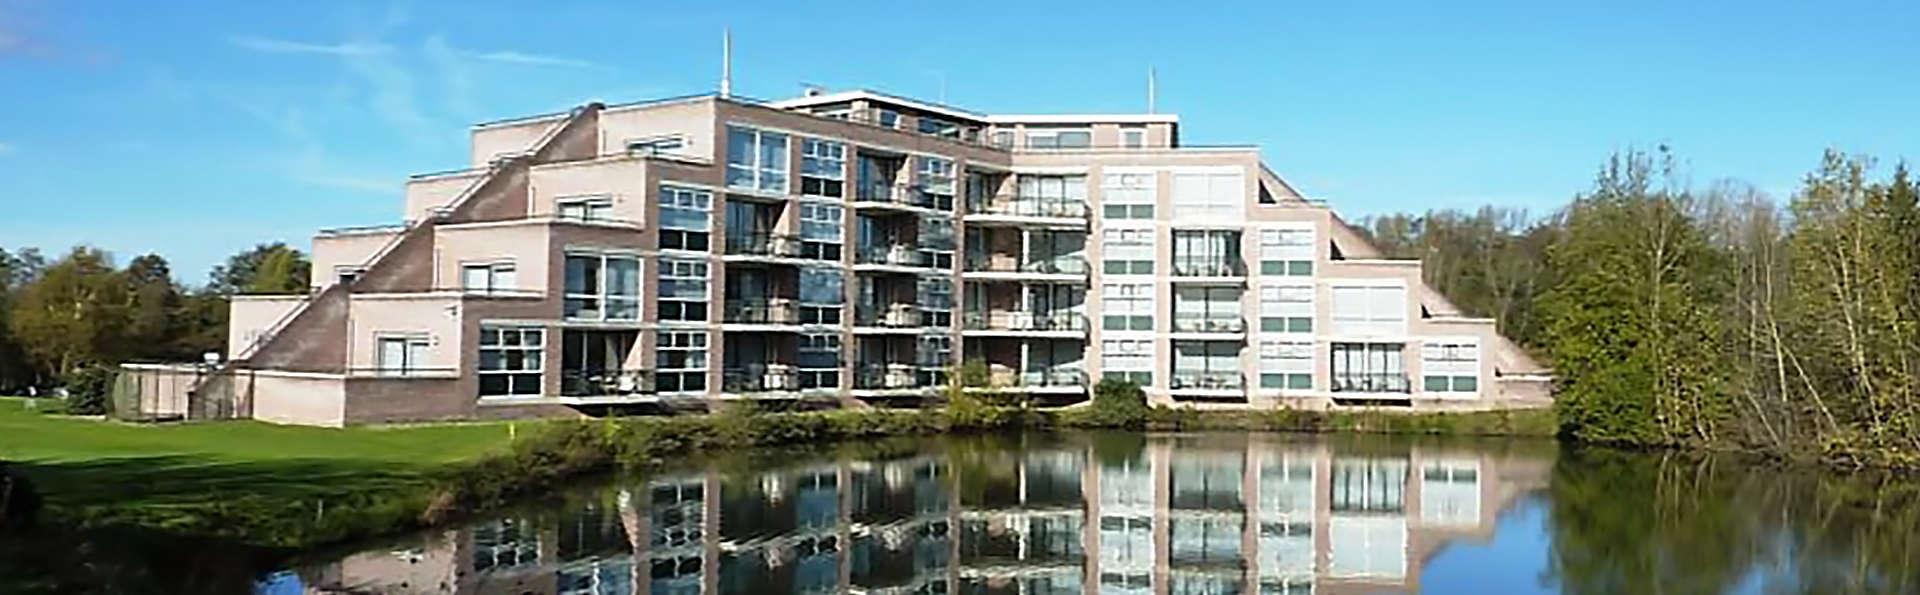 Hotel Golf Residentie Brunssummerheide - EDIT_front2.jpg